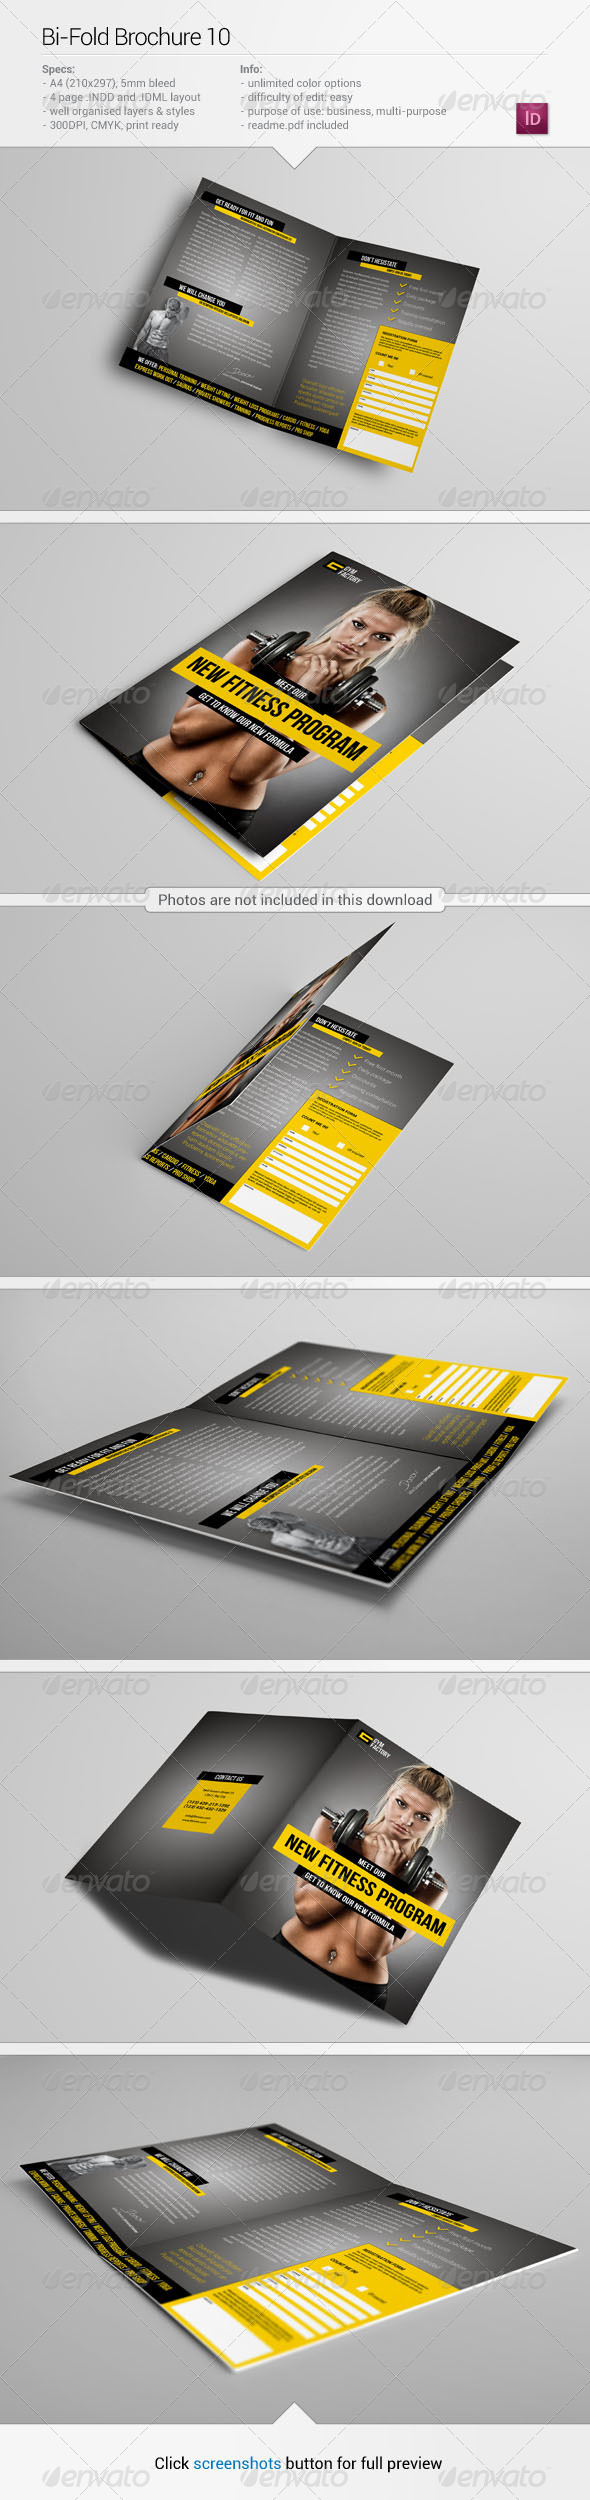 GraphicRiver Bi-Fold Brochure 10 5448246